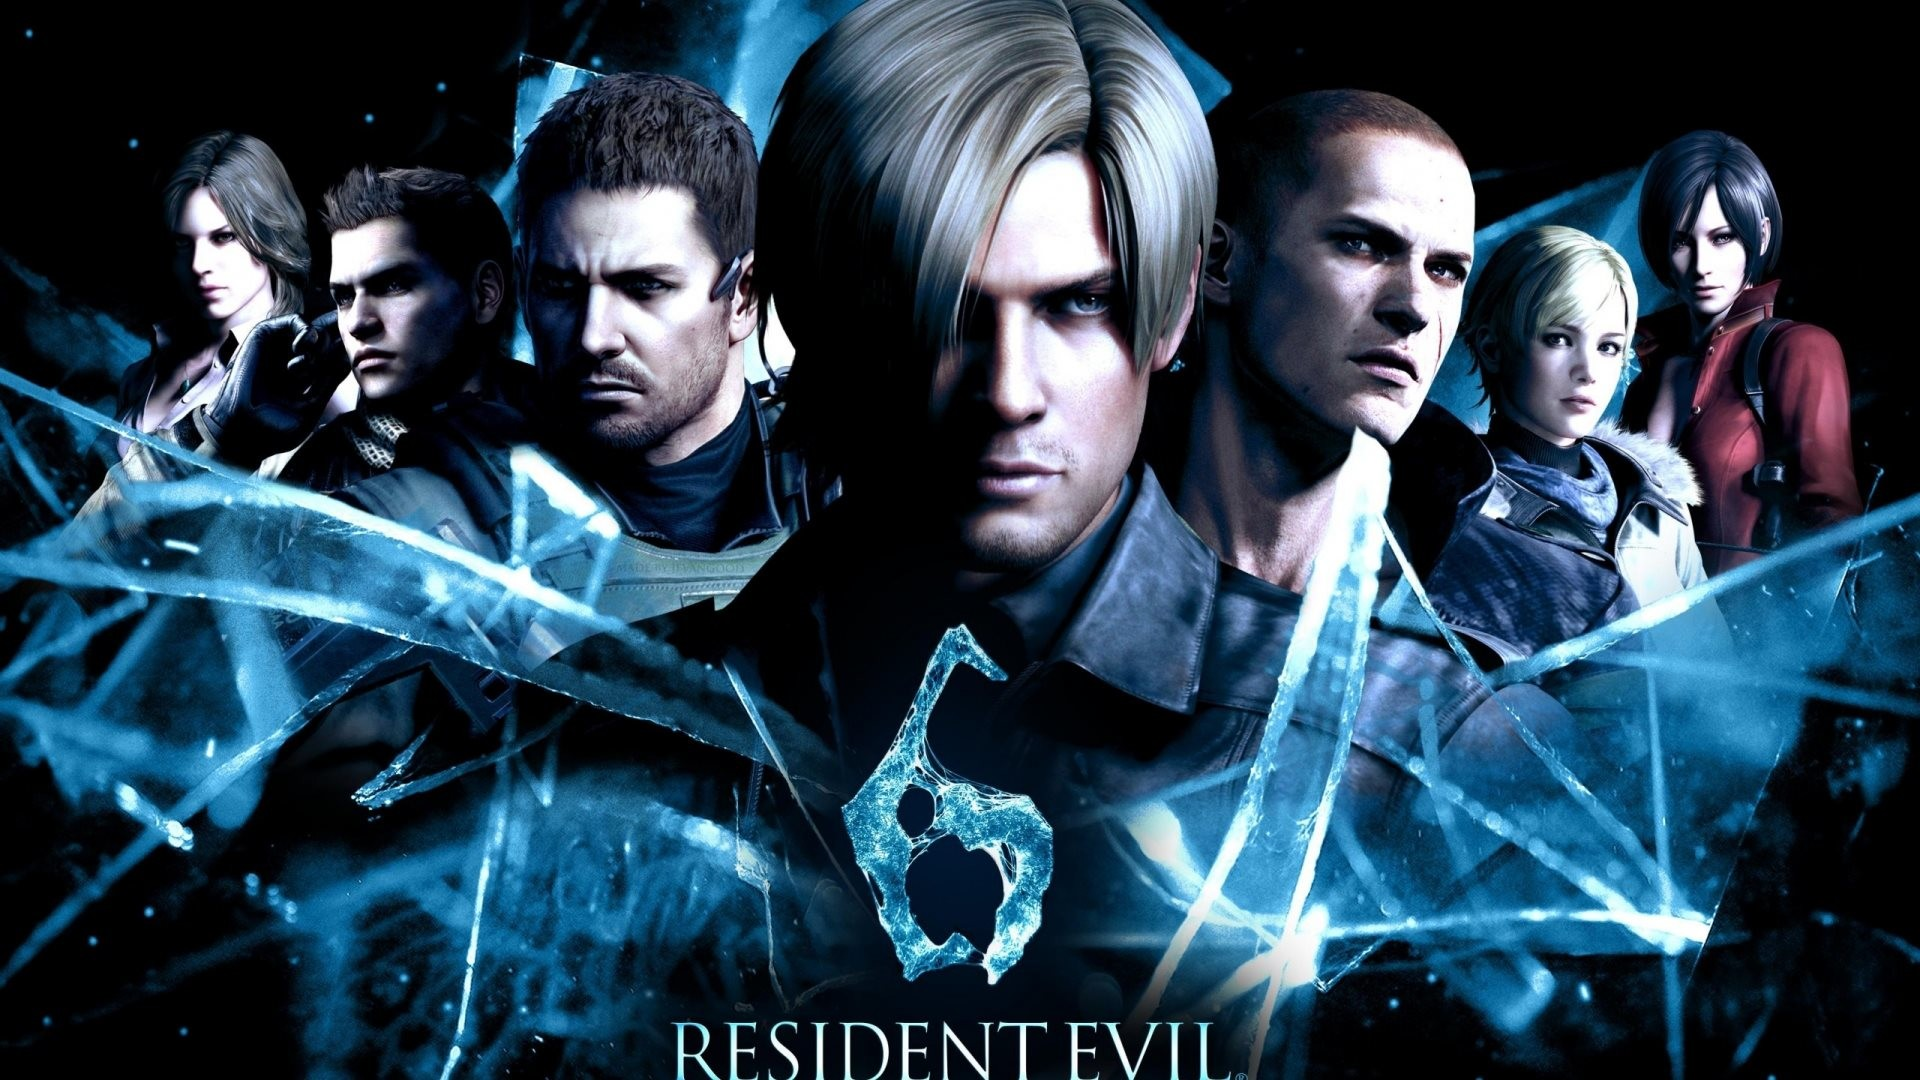 Wide (Desktop / Macbook): 2560×1600 (fits on: 1920×1080, 1440×900,  1280×800). Resident Evil 6 HD